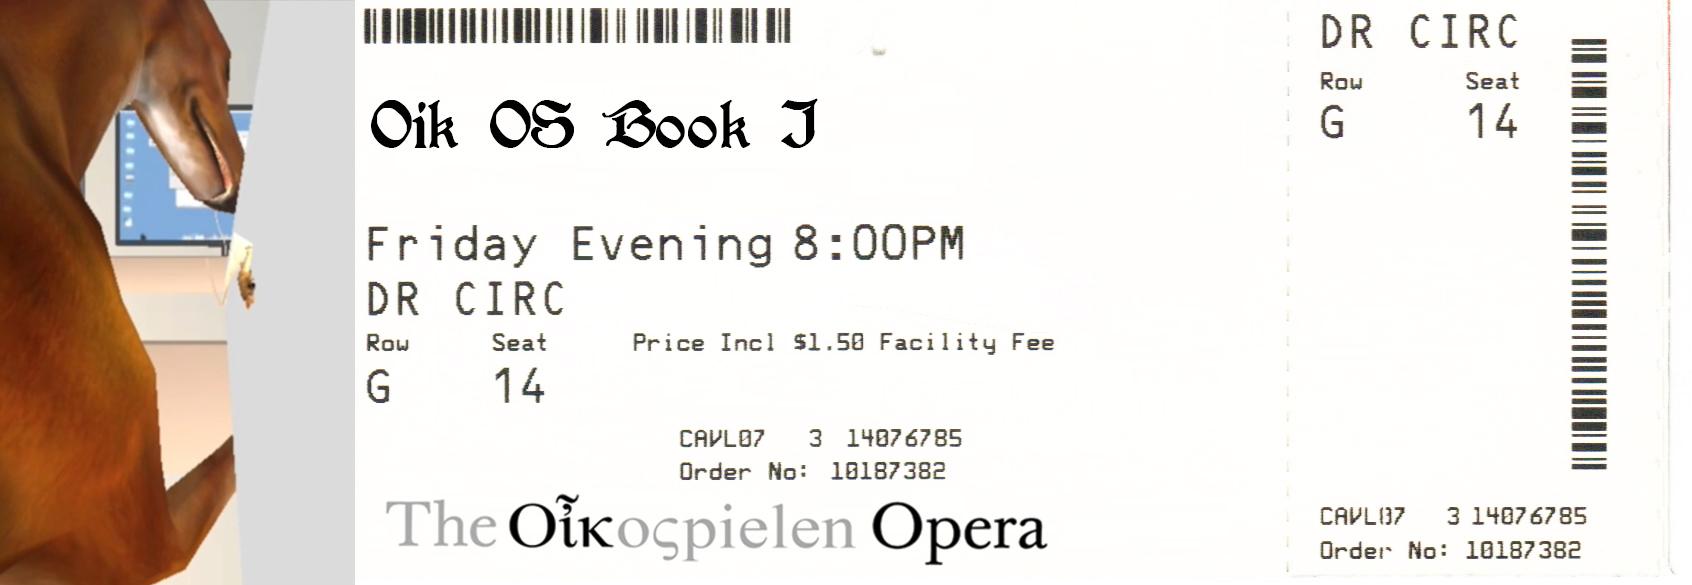 http://www.oikospiel.com/img/ticket2.jpg